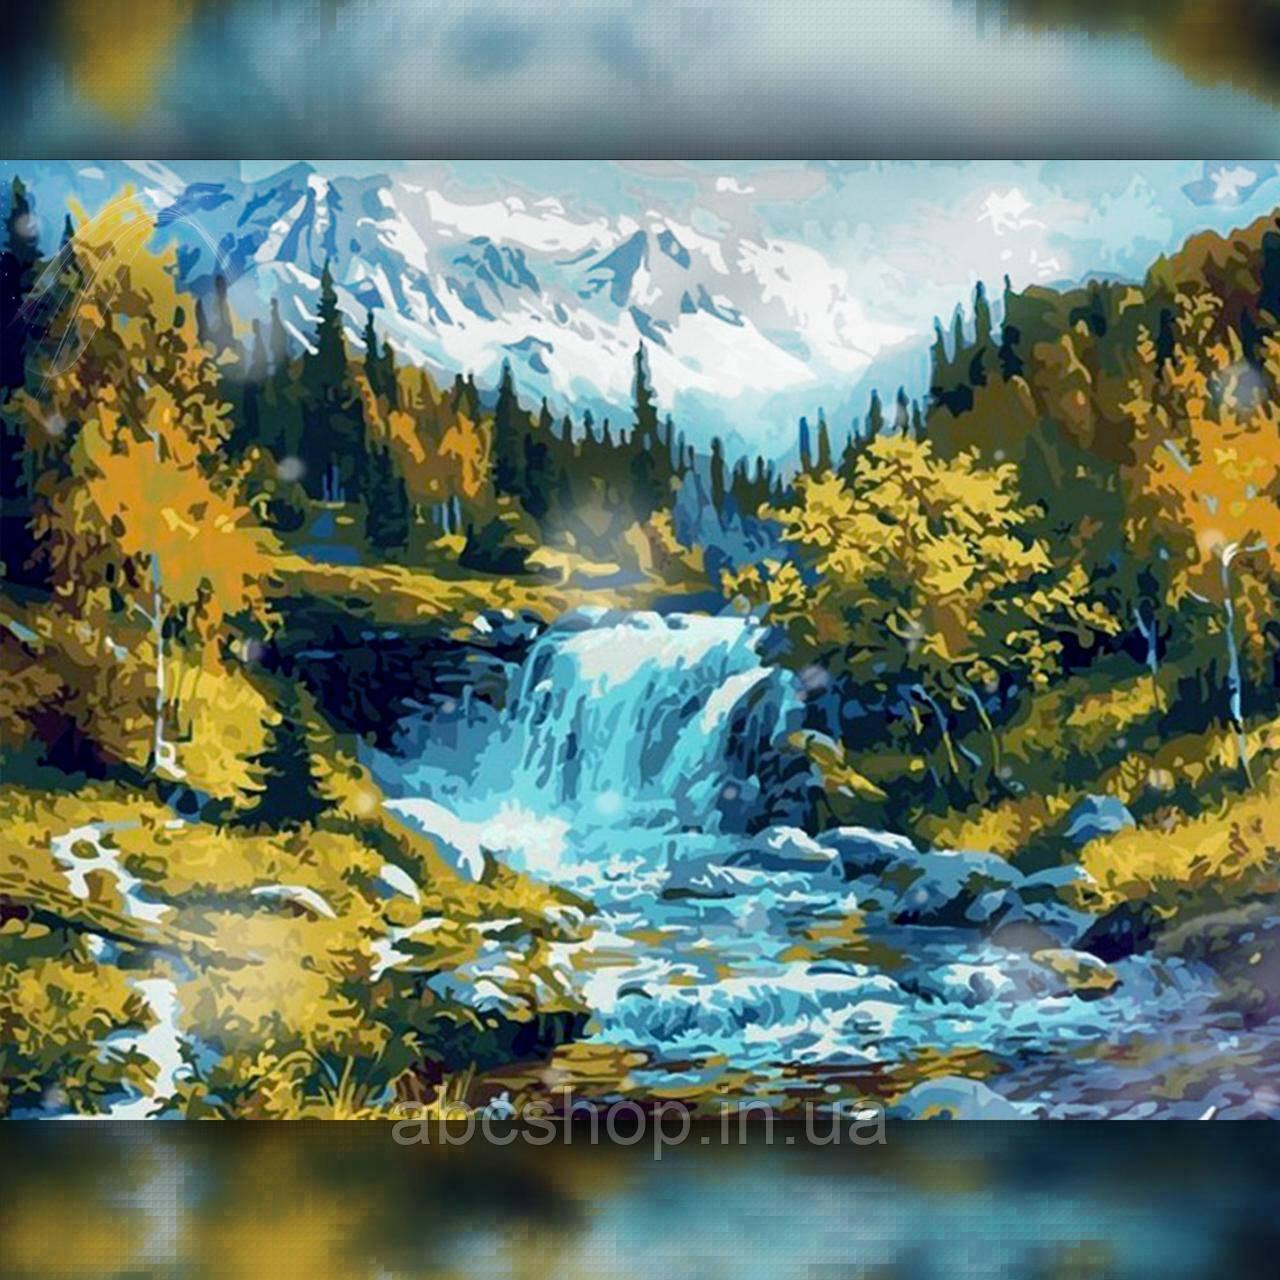 Алмазная вышивка Лесной водопад 30x40 The Wortex Diamonds (TWD30043)